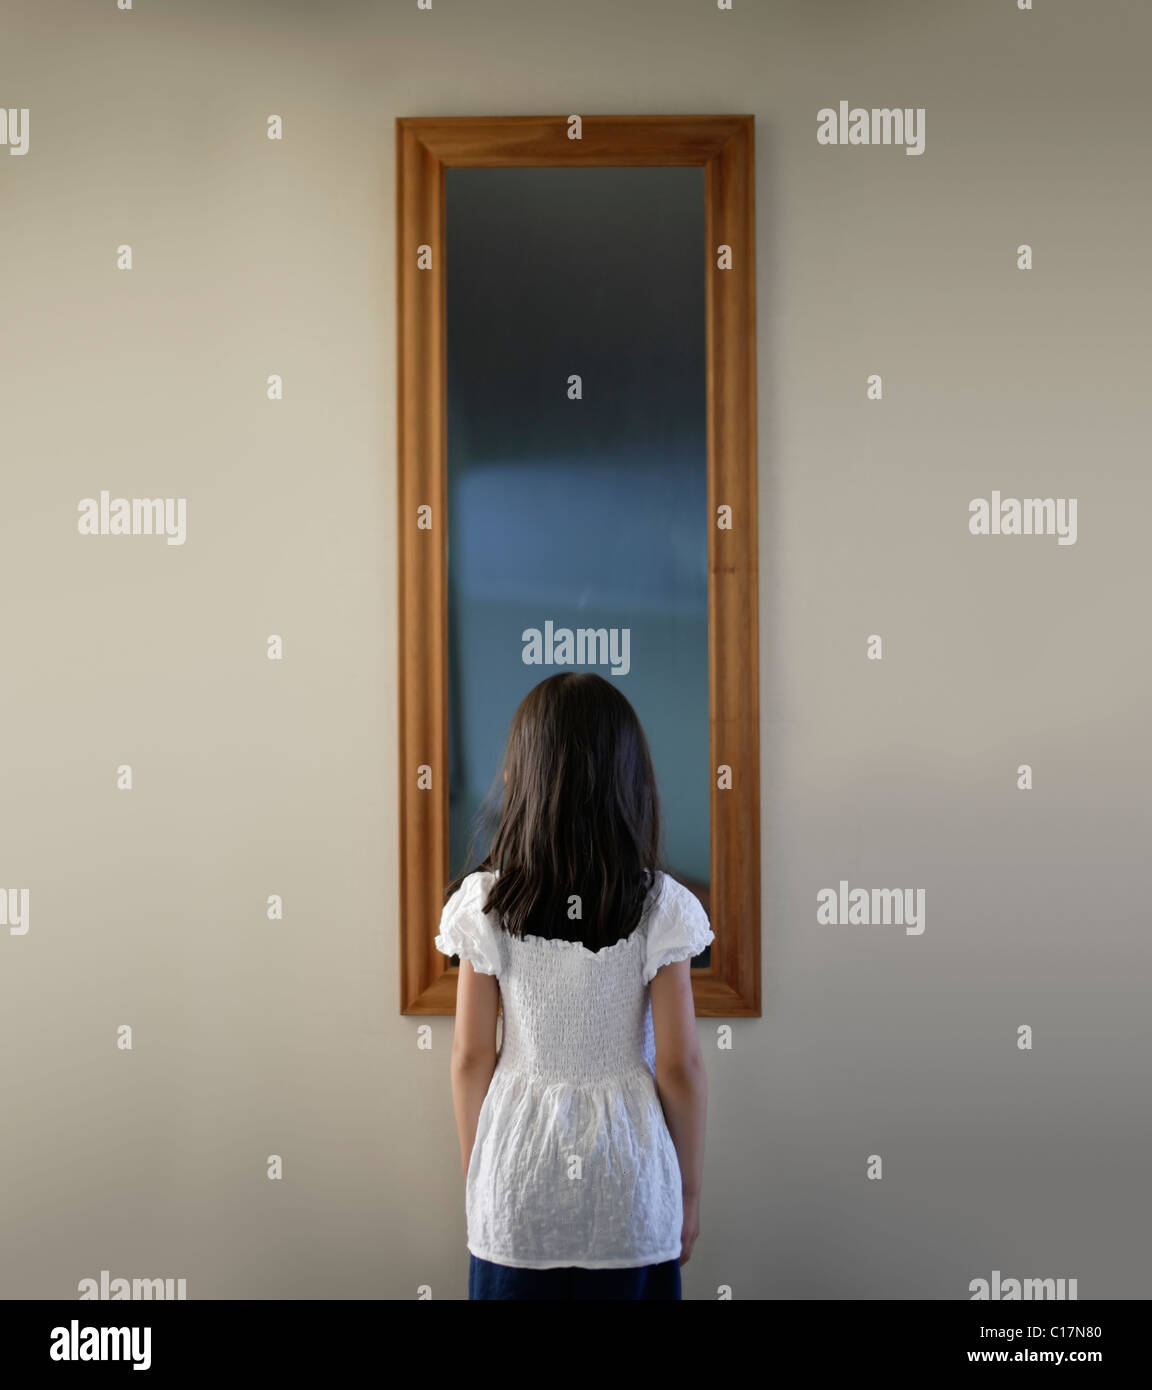 Mirror Mirror On The Wall Stock Photo Alamy